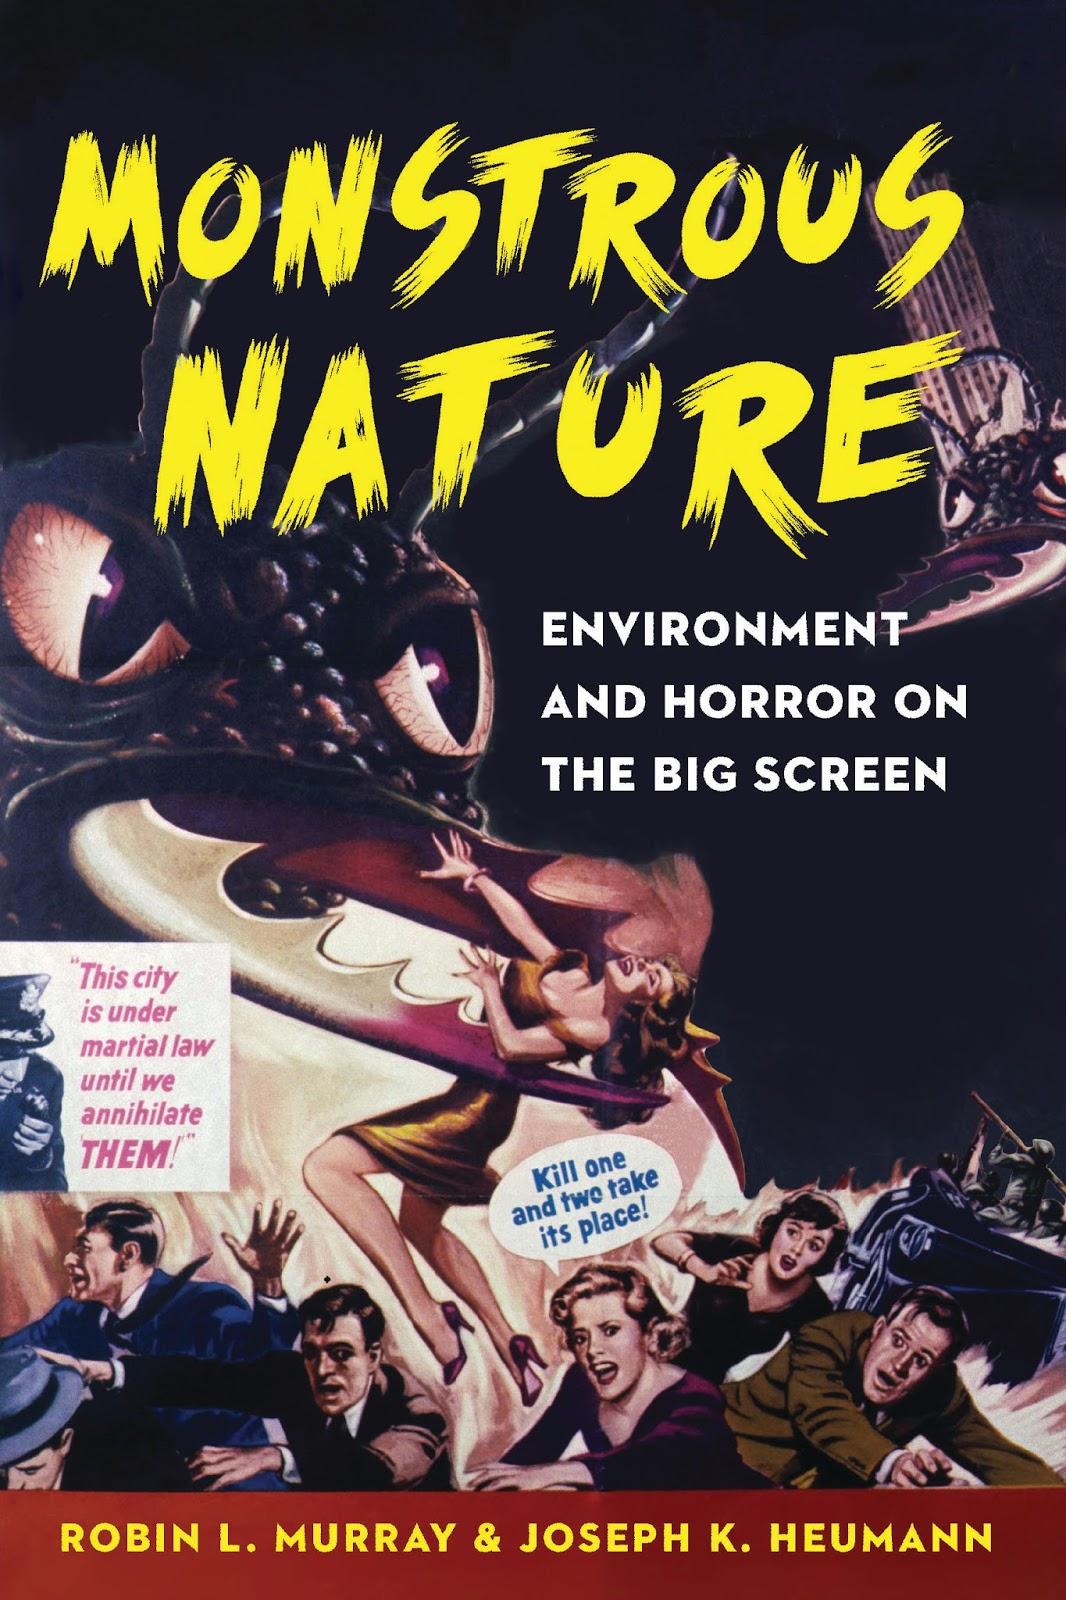 Ecocinema, Media, and the Environment: Future Fictional